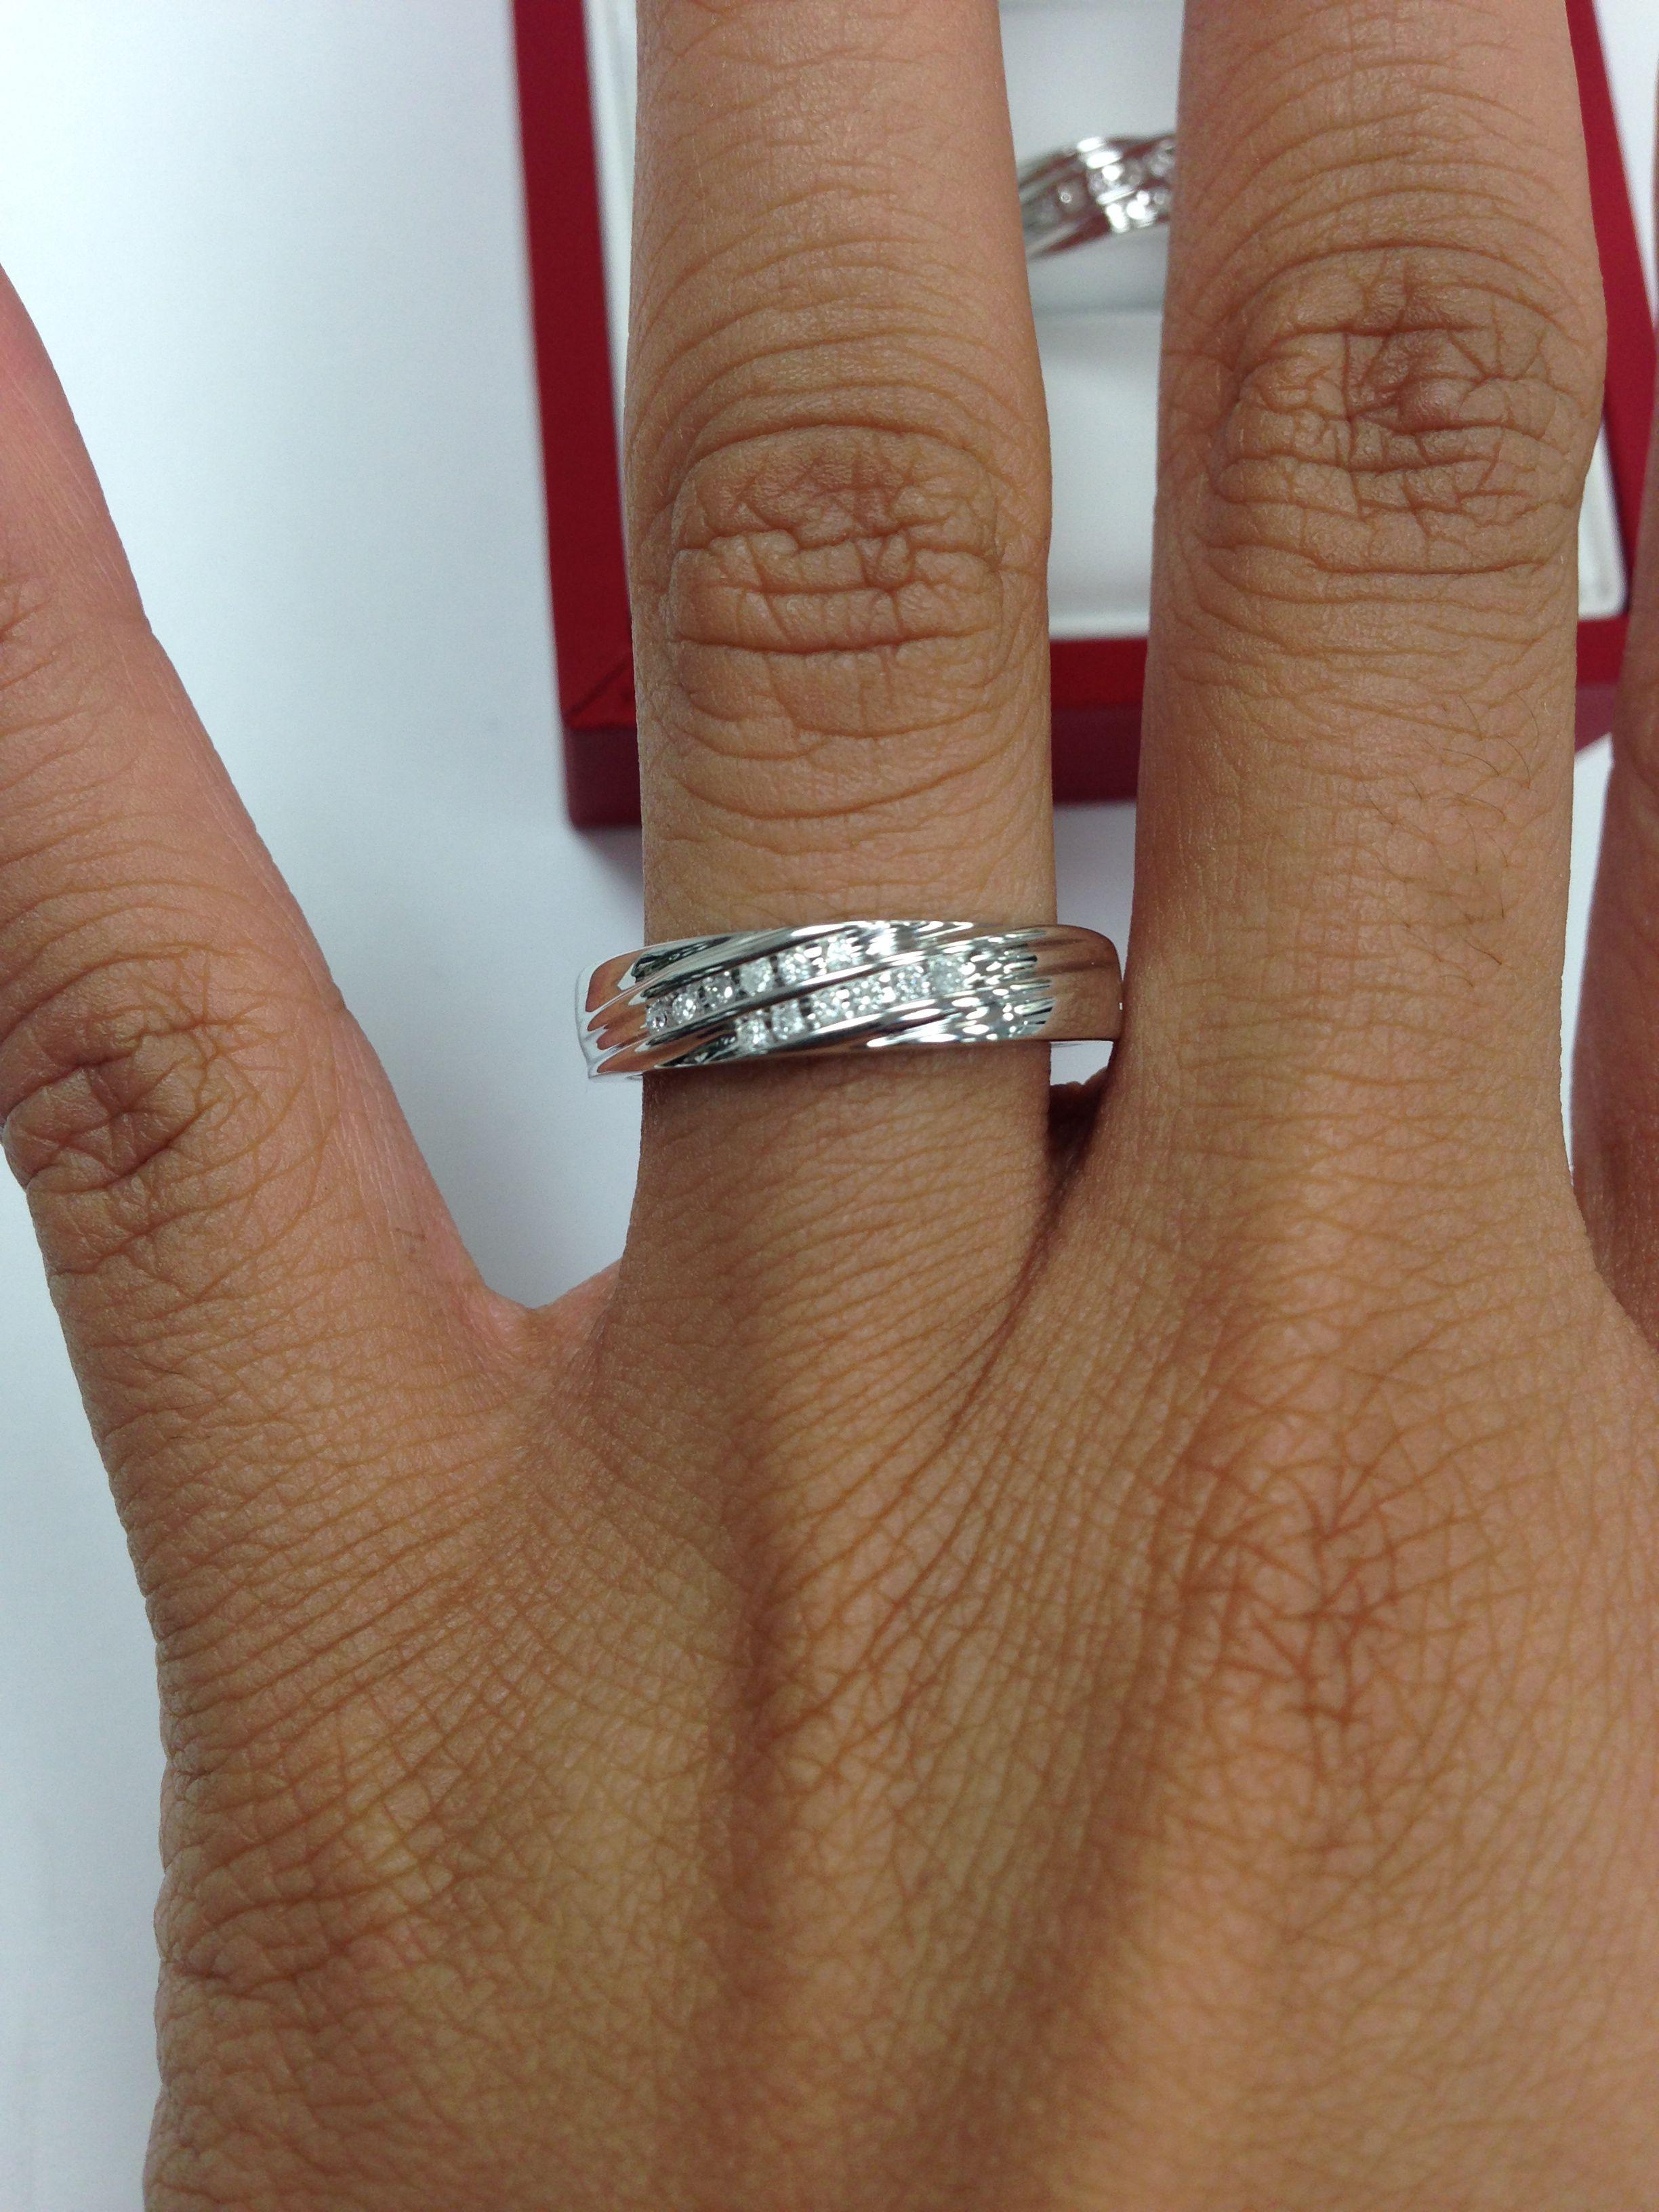 Rings on Hand Mens Wedding Band BT519WM Rings, Gold